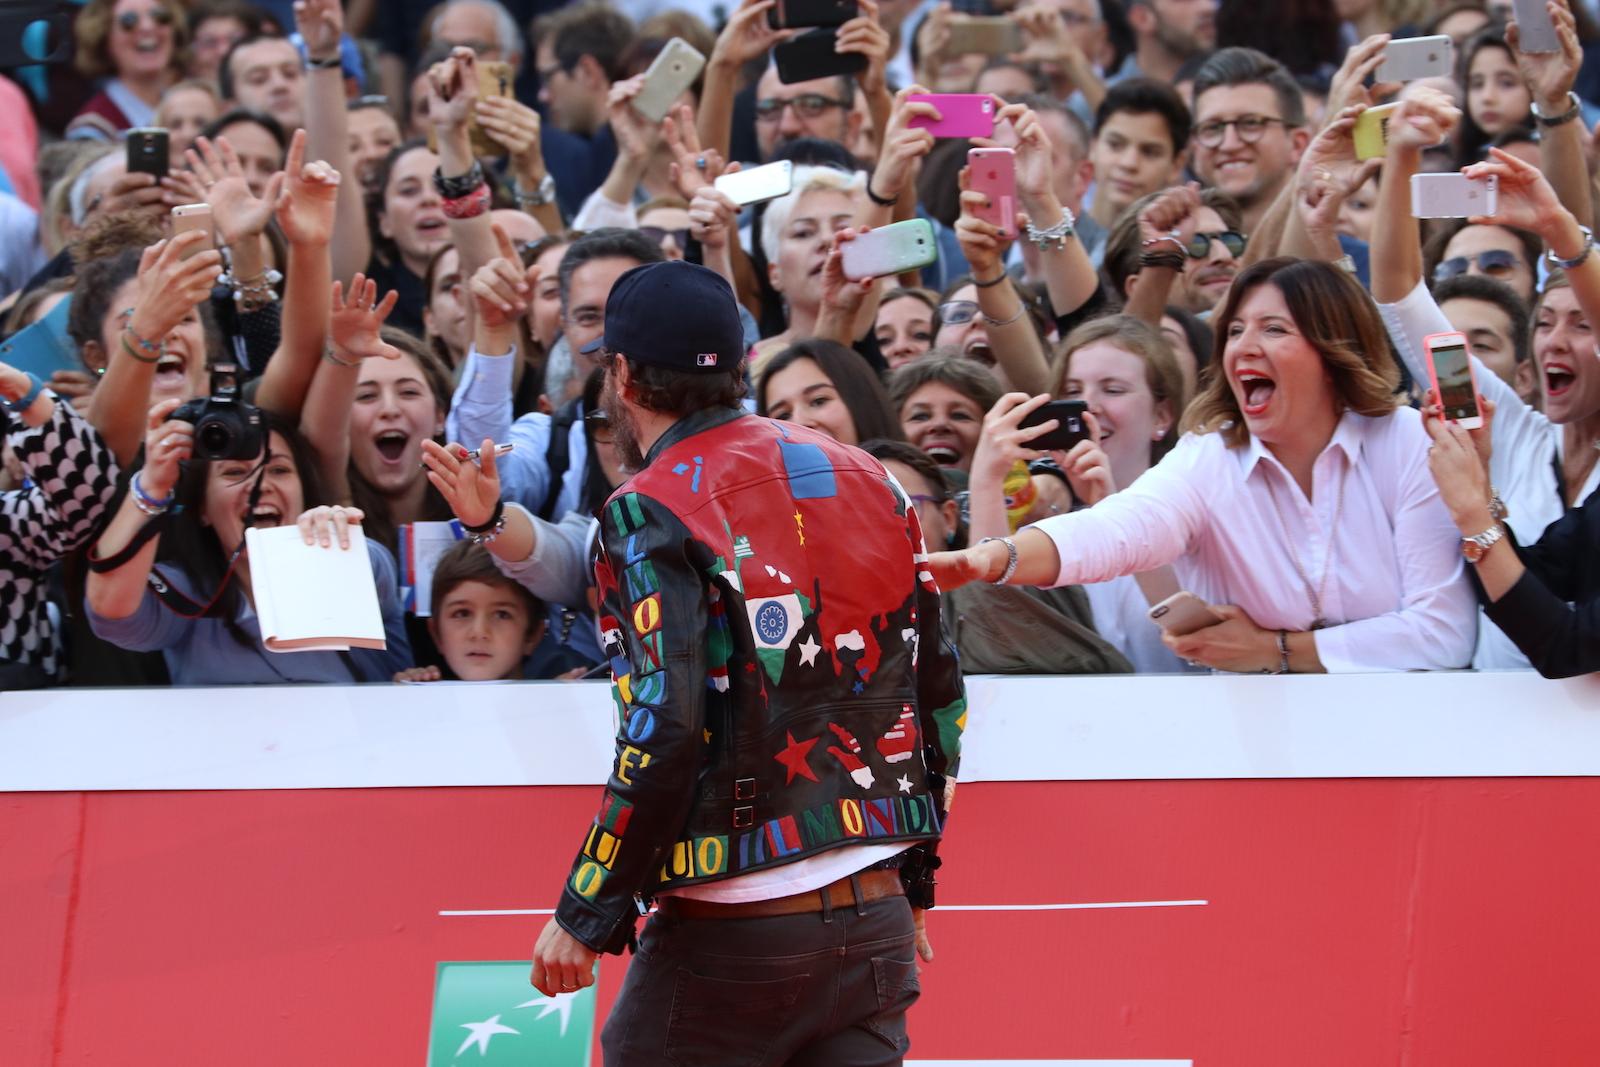 Roma 2016: Jovanotti davanti ai fan sul red carpet